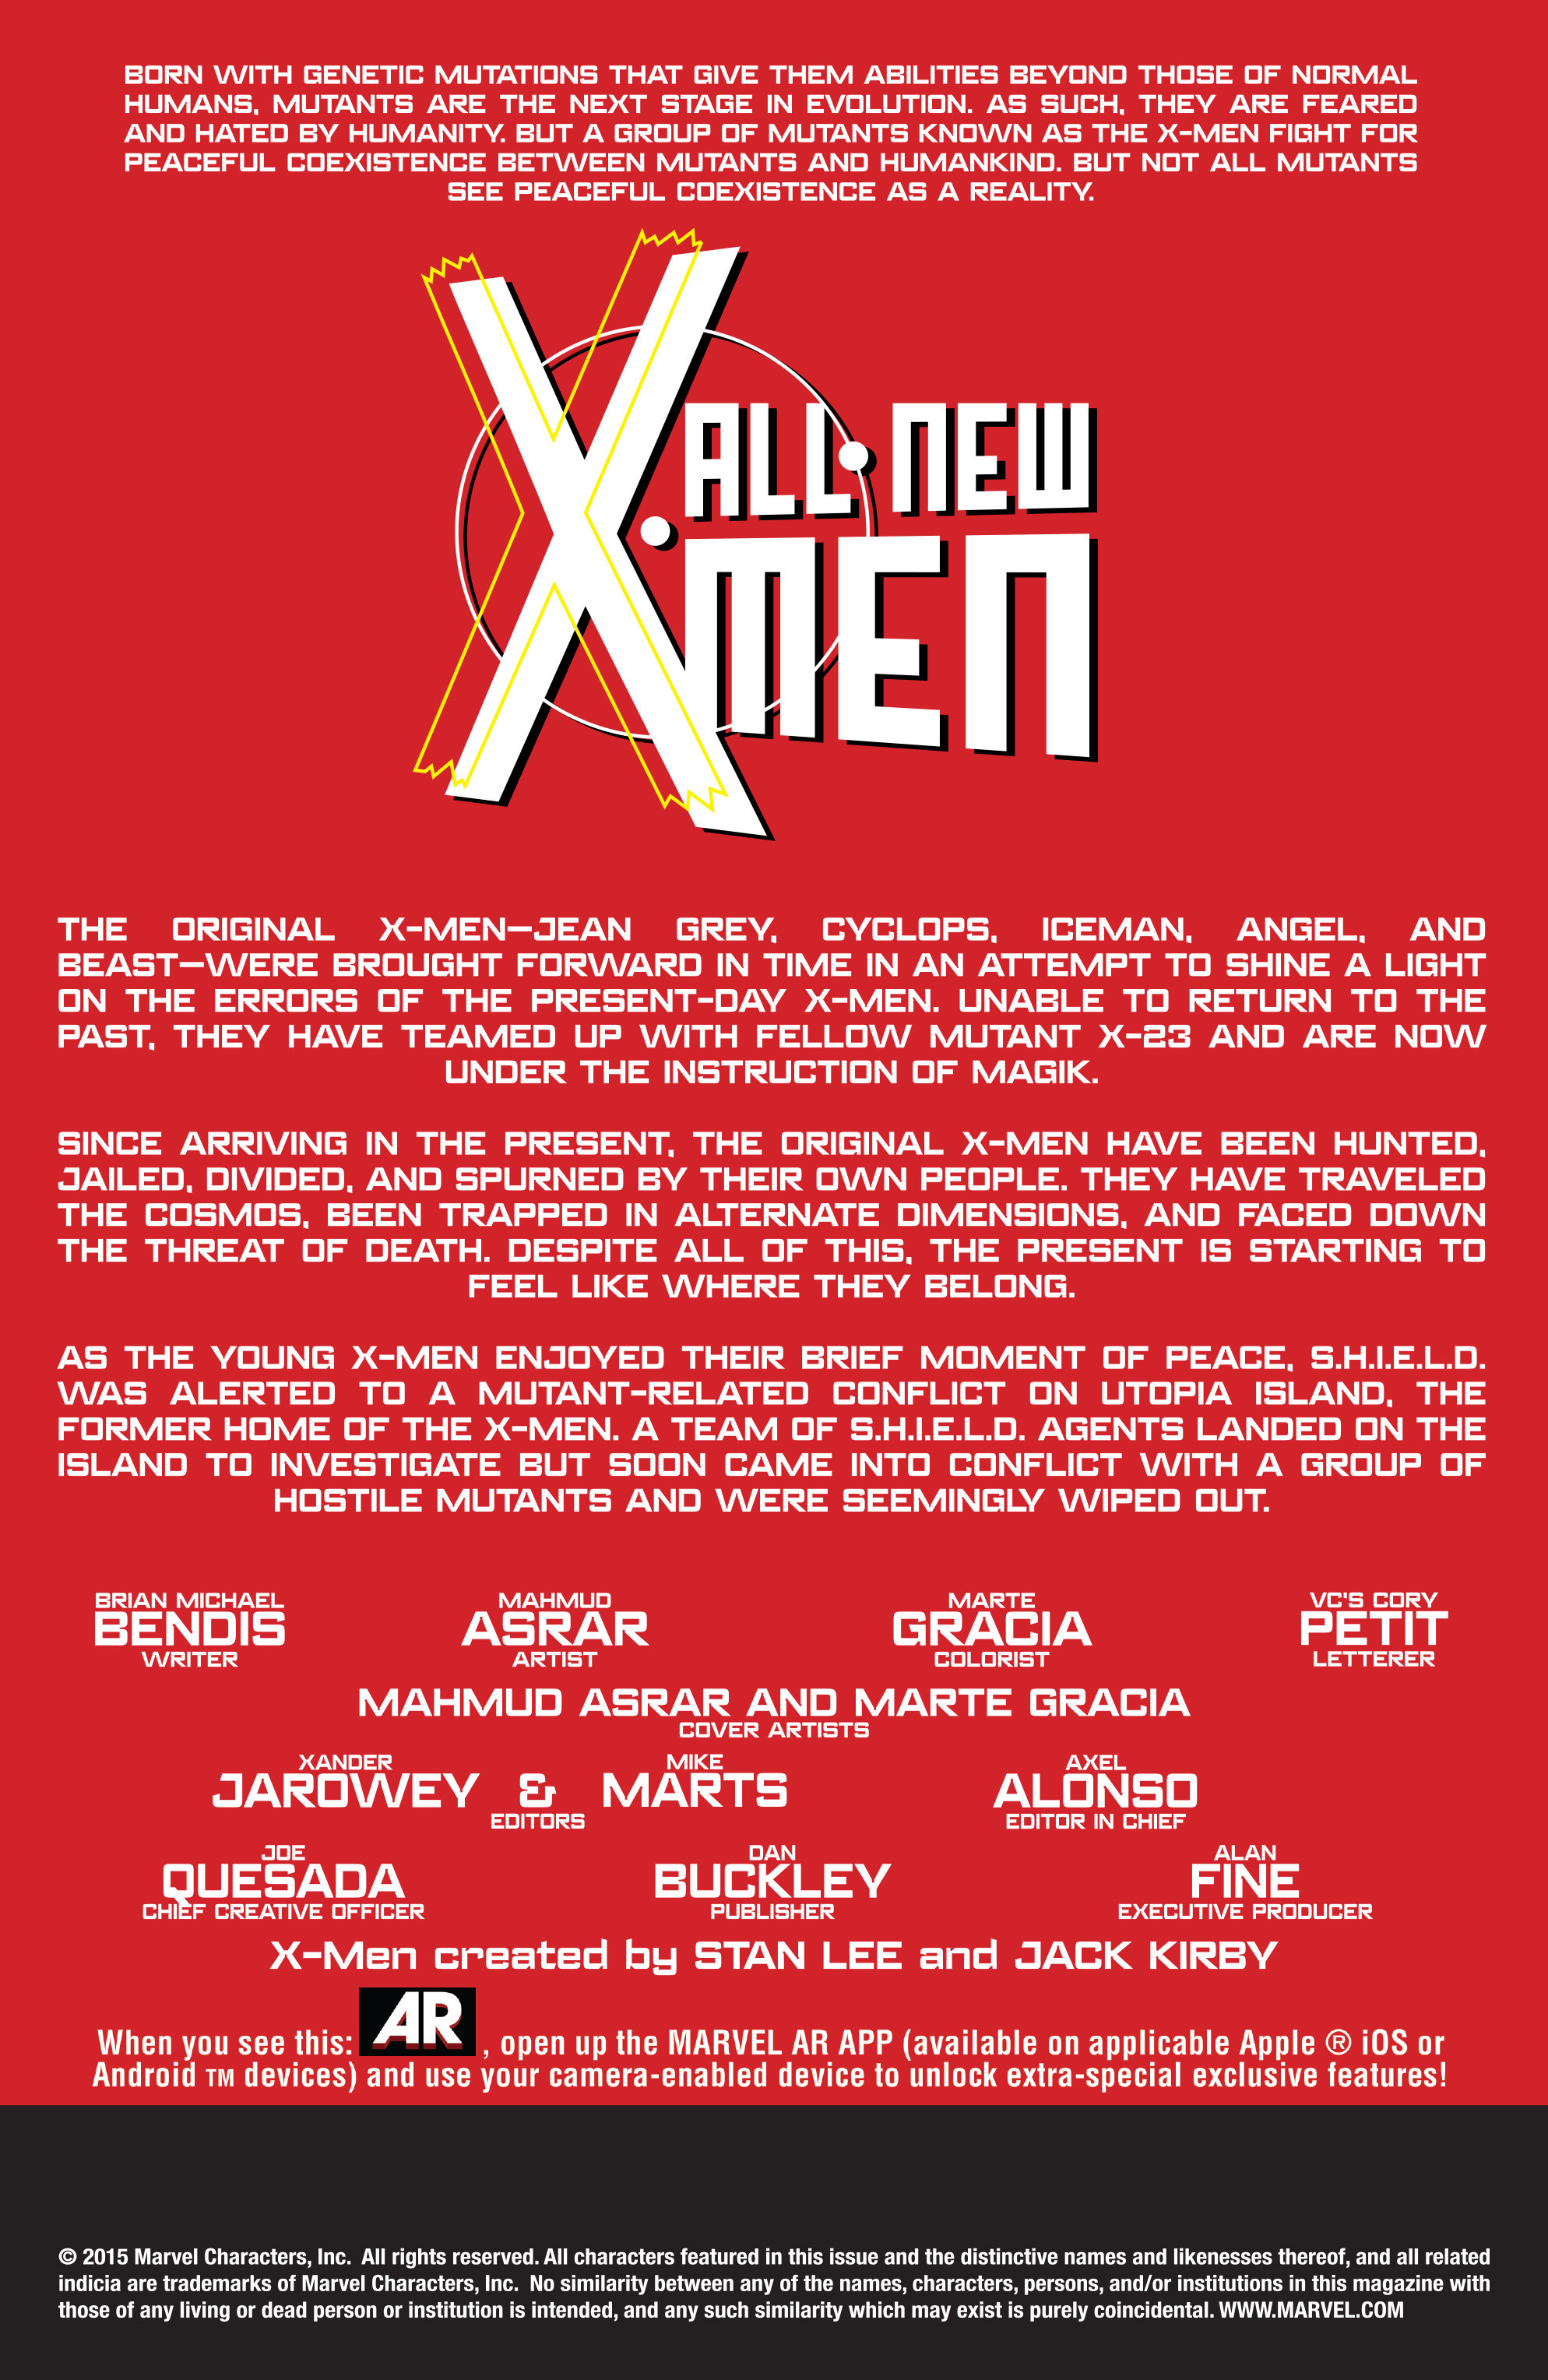 All-New X-Men (2013) chap 41 pic 2